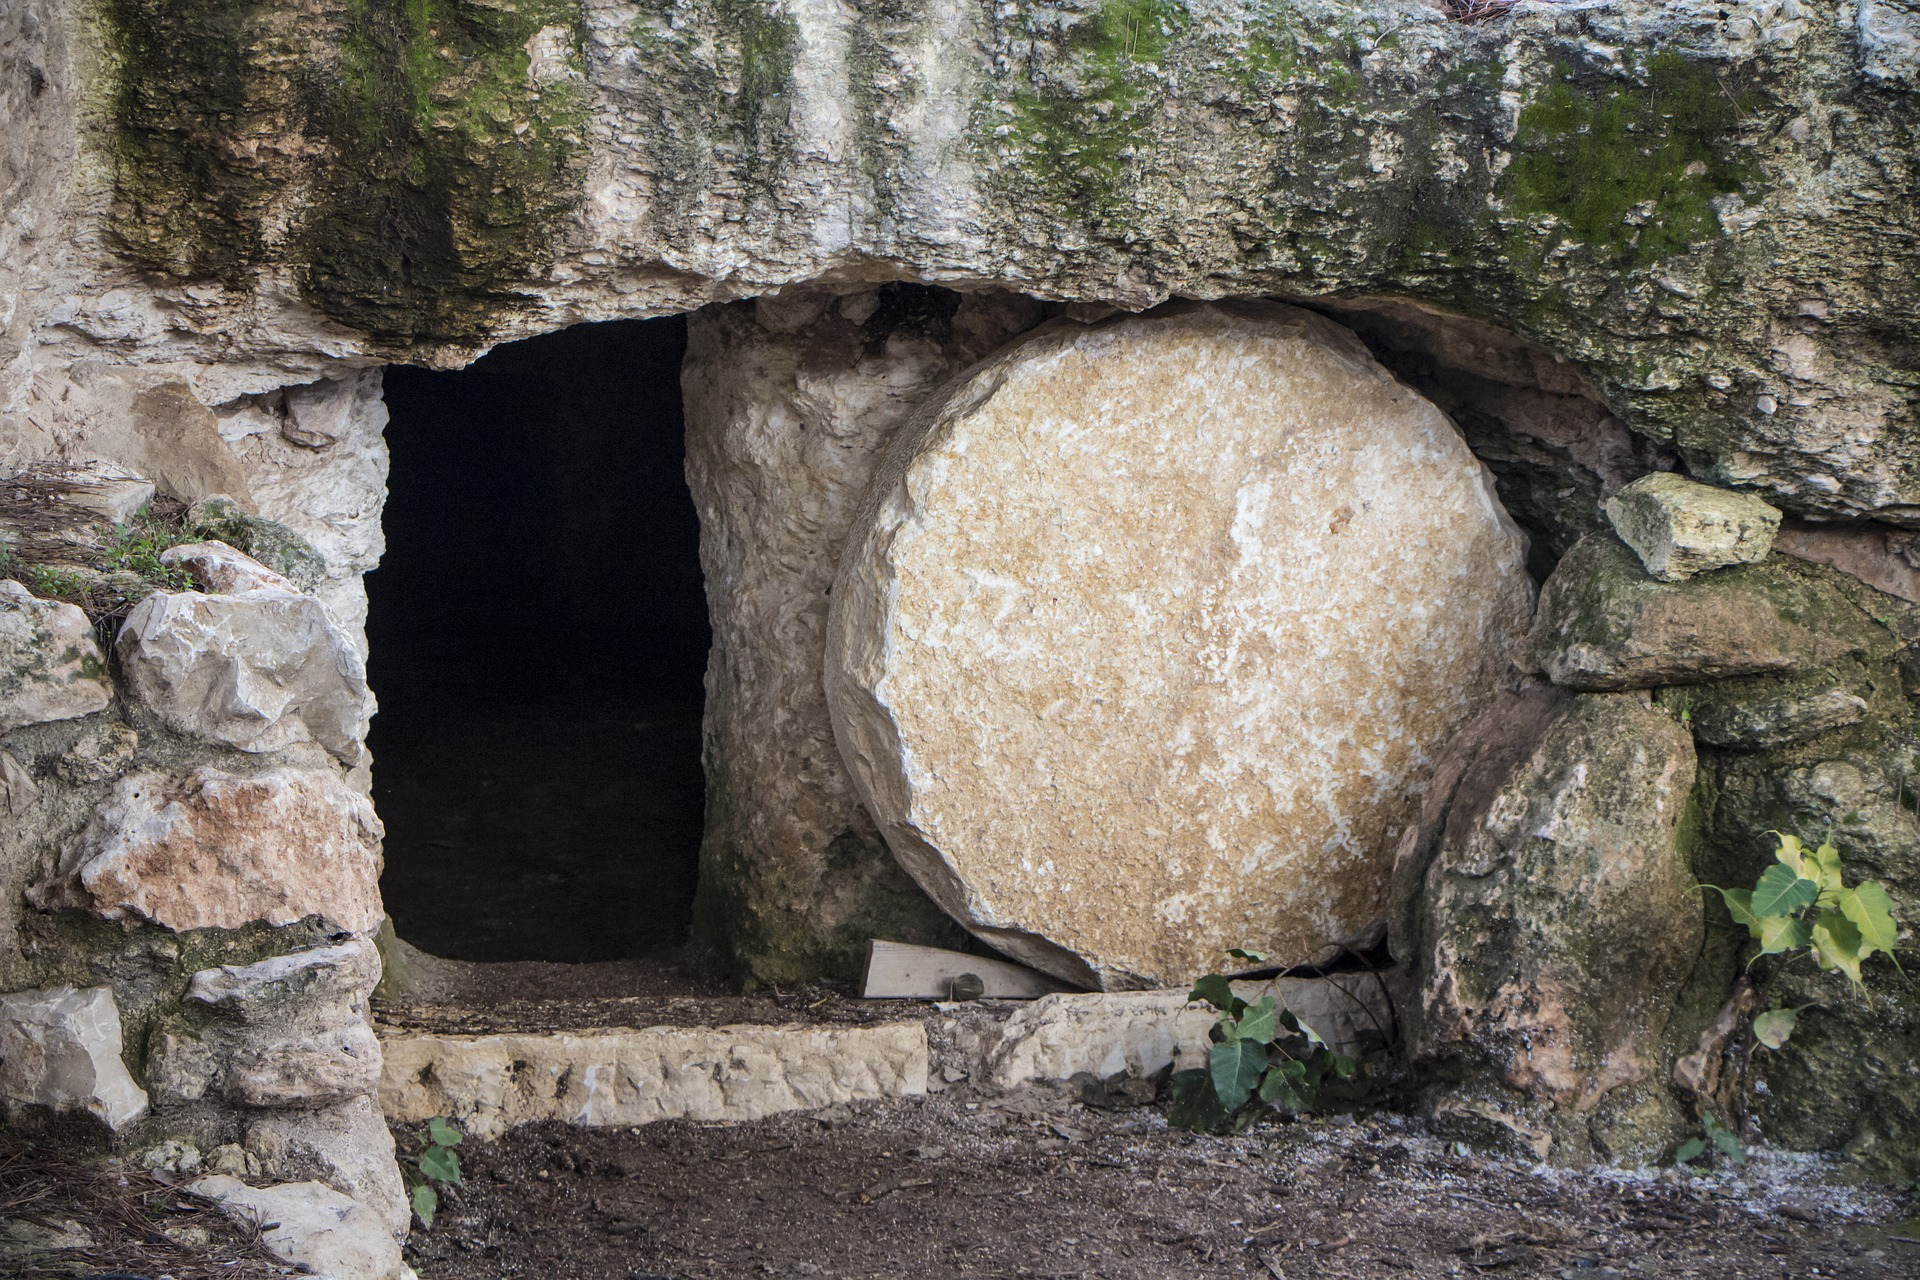 Easter Sunday service online